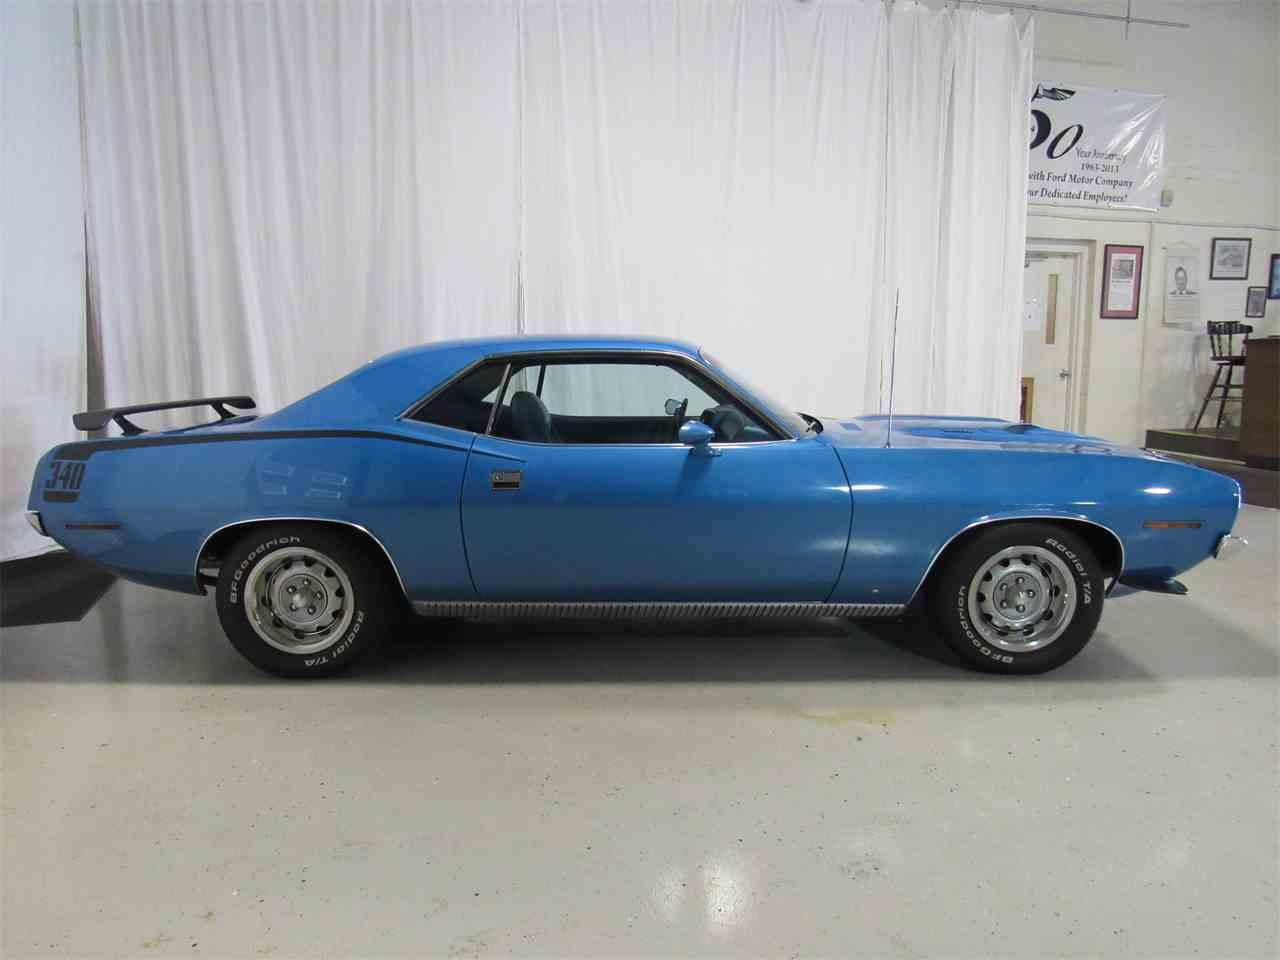 1970 Plymouth Cuda For Sale Classiccars Com Cc 964175